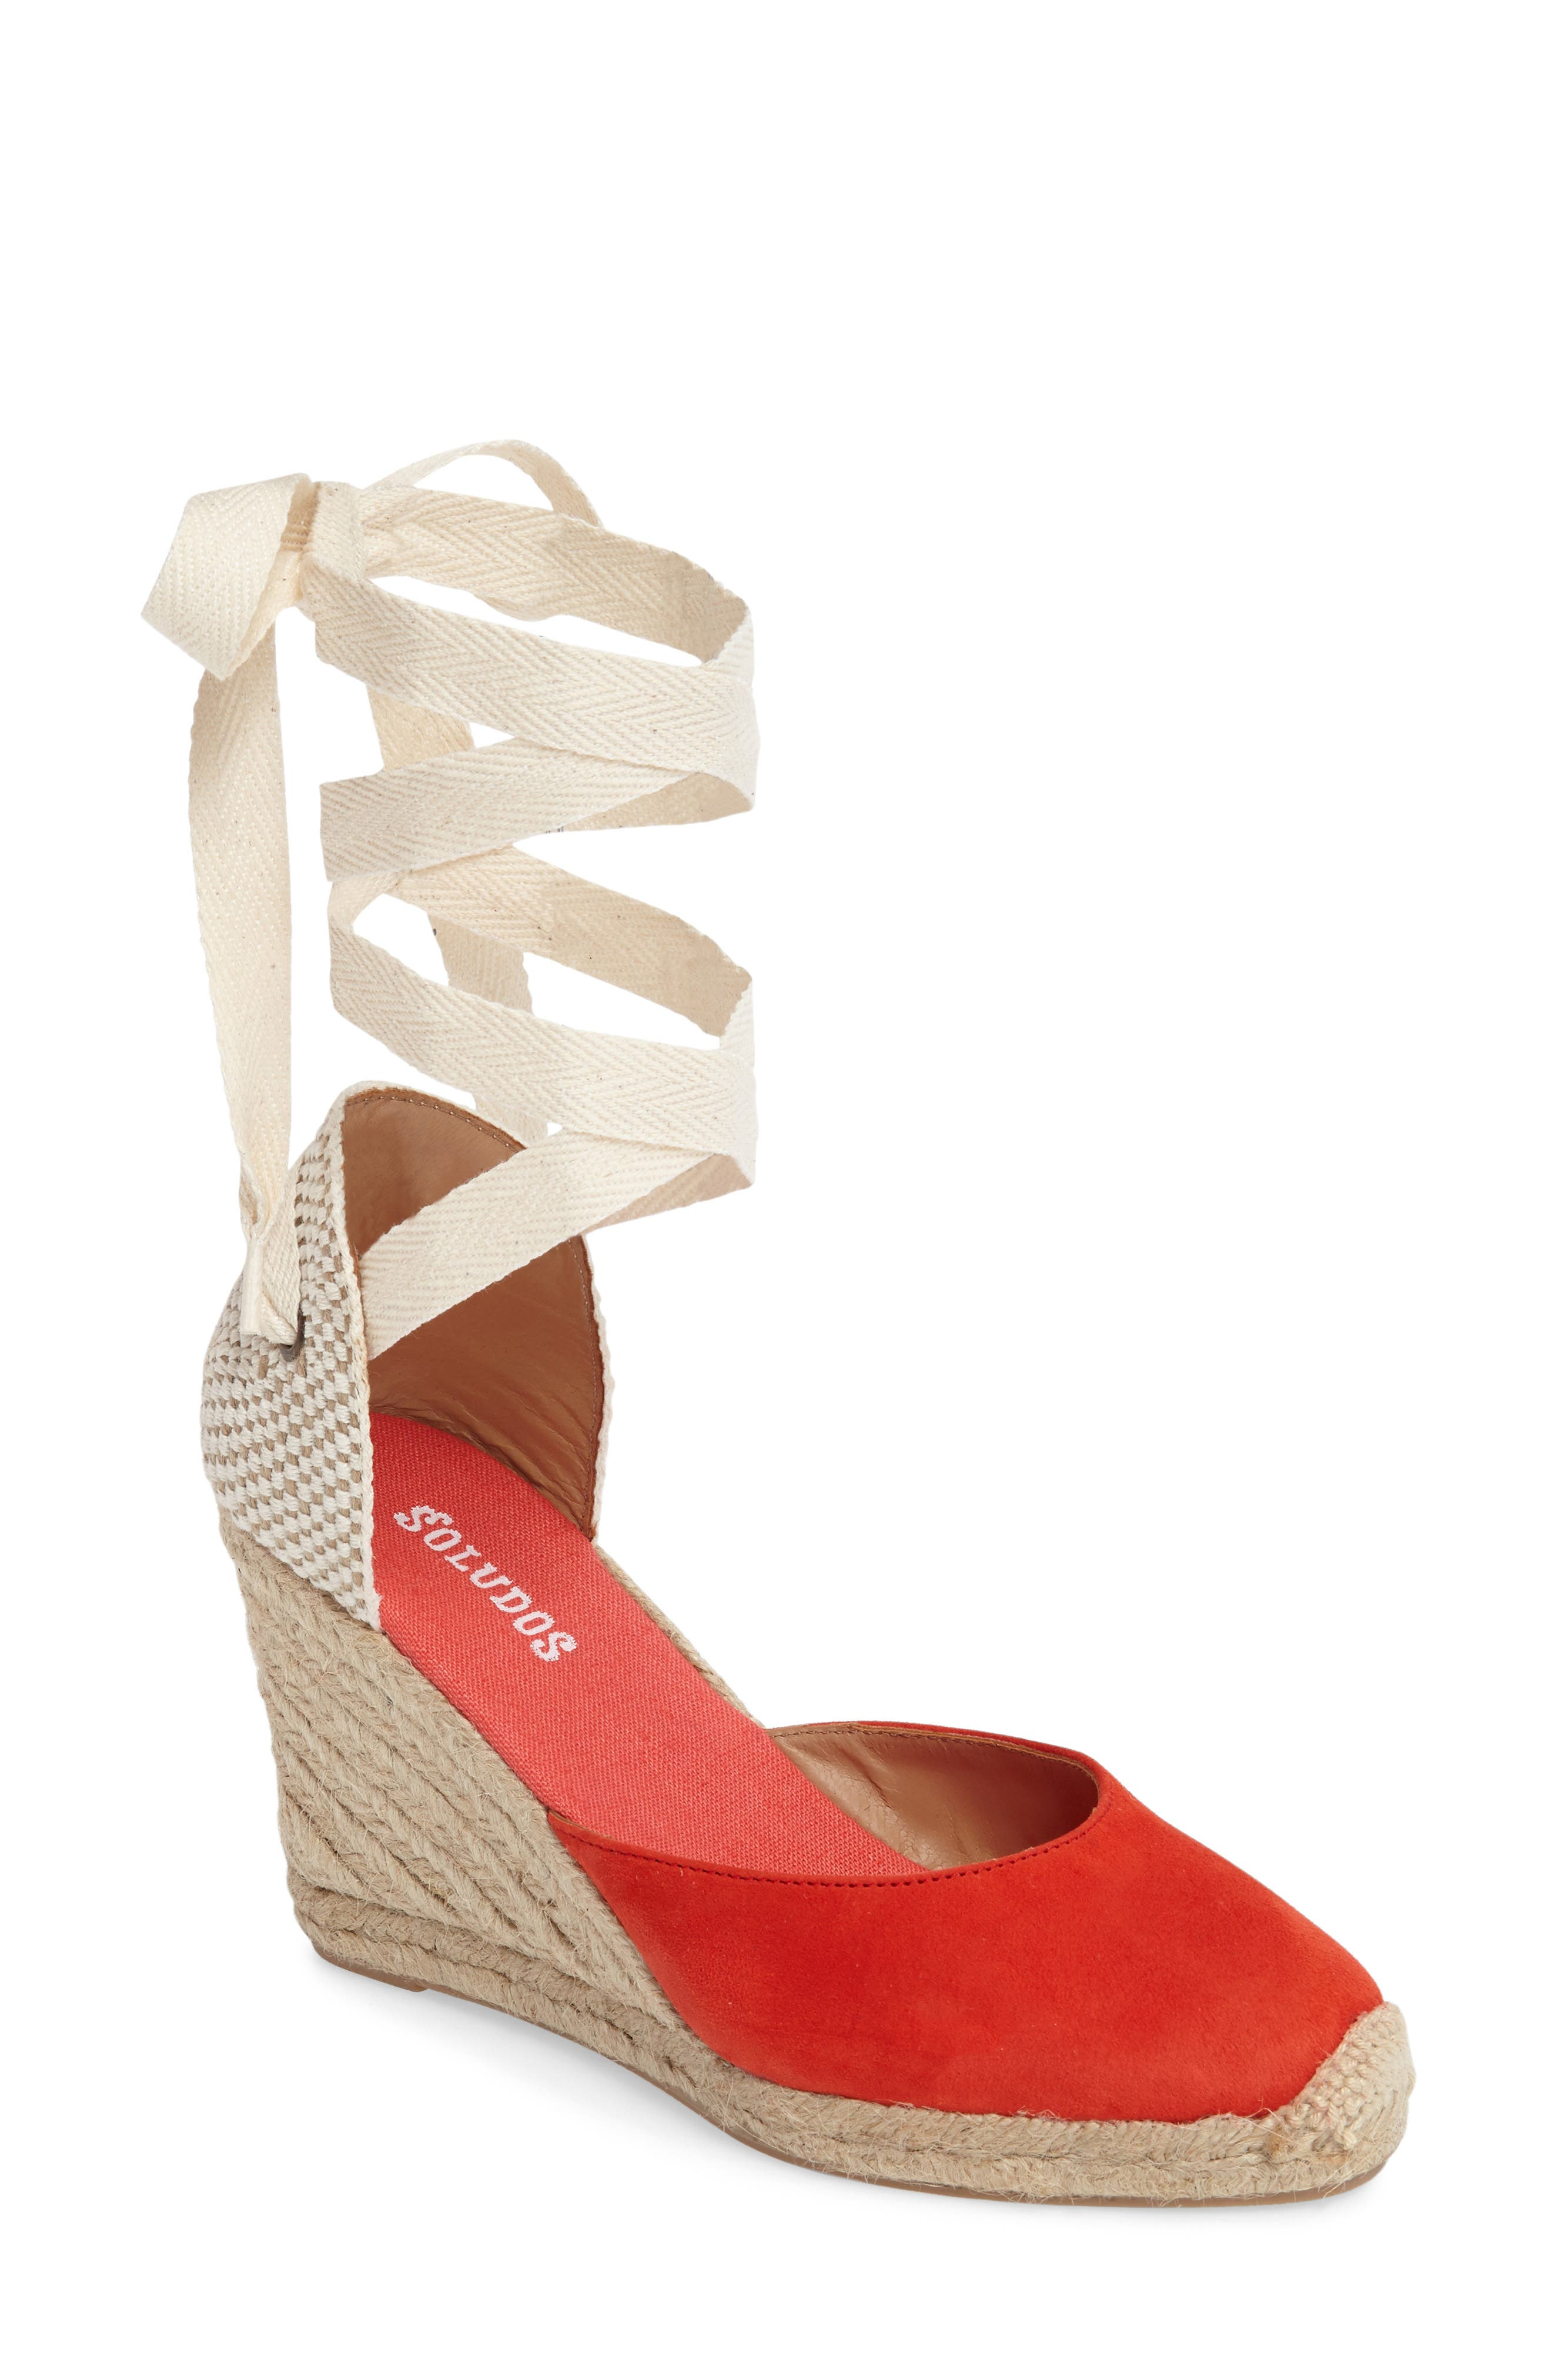 Wedge Sandal,                         Main,                         color, 605